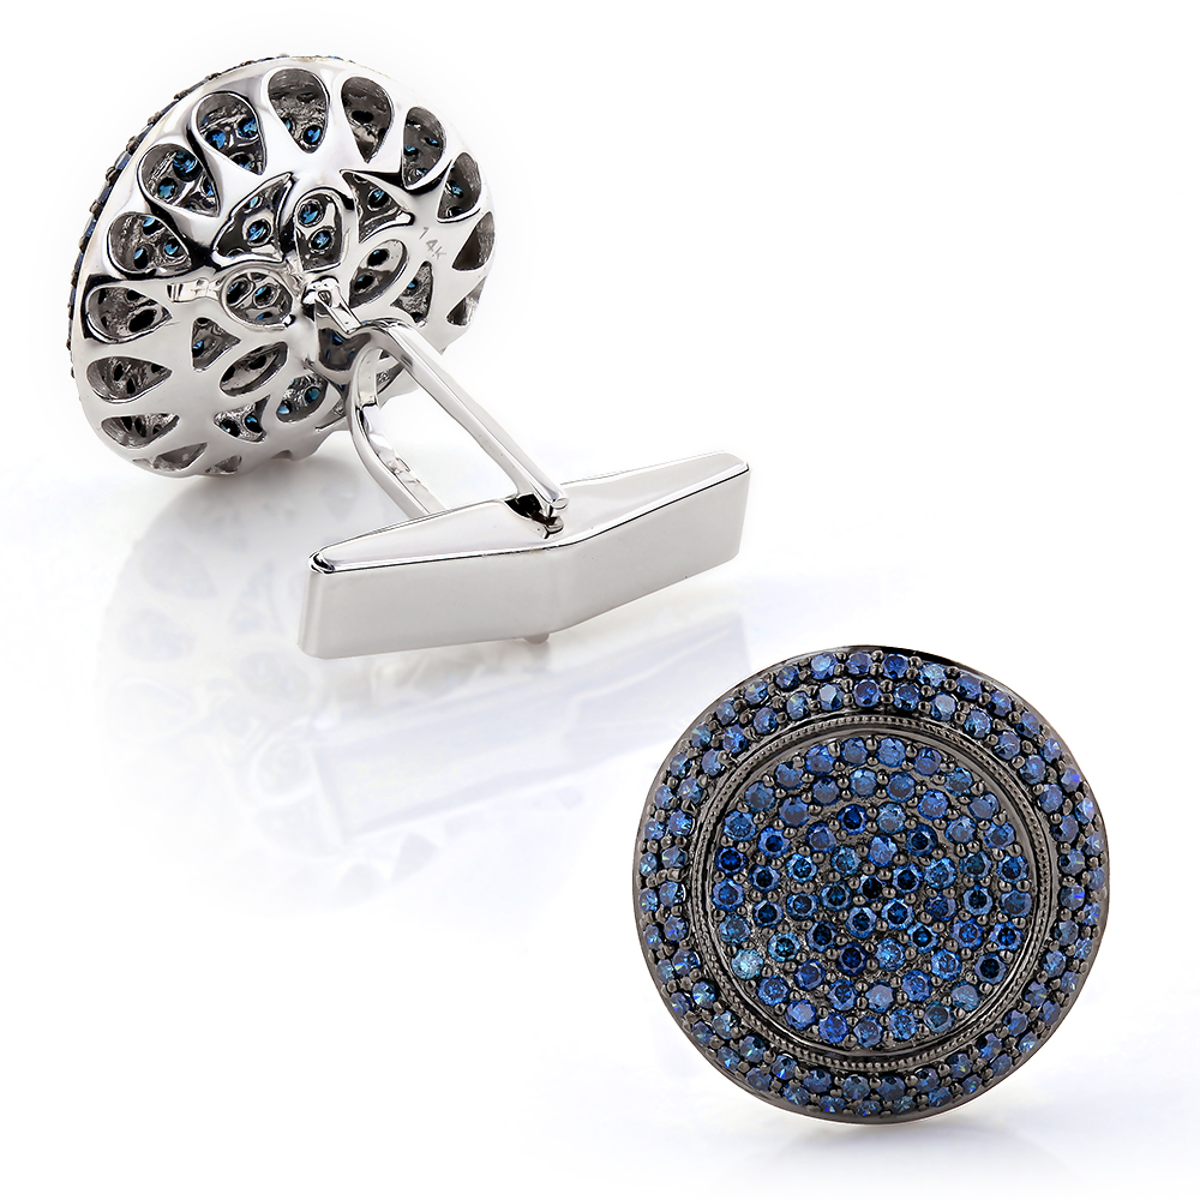 Mens & Womens Luxury Cufflinks: Custom Blue Diamond Cufflinks 14K Gold